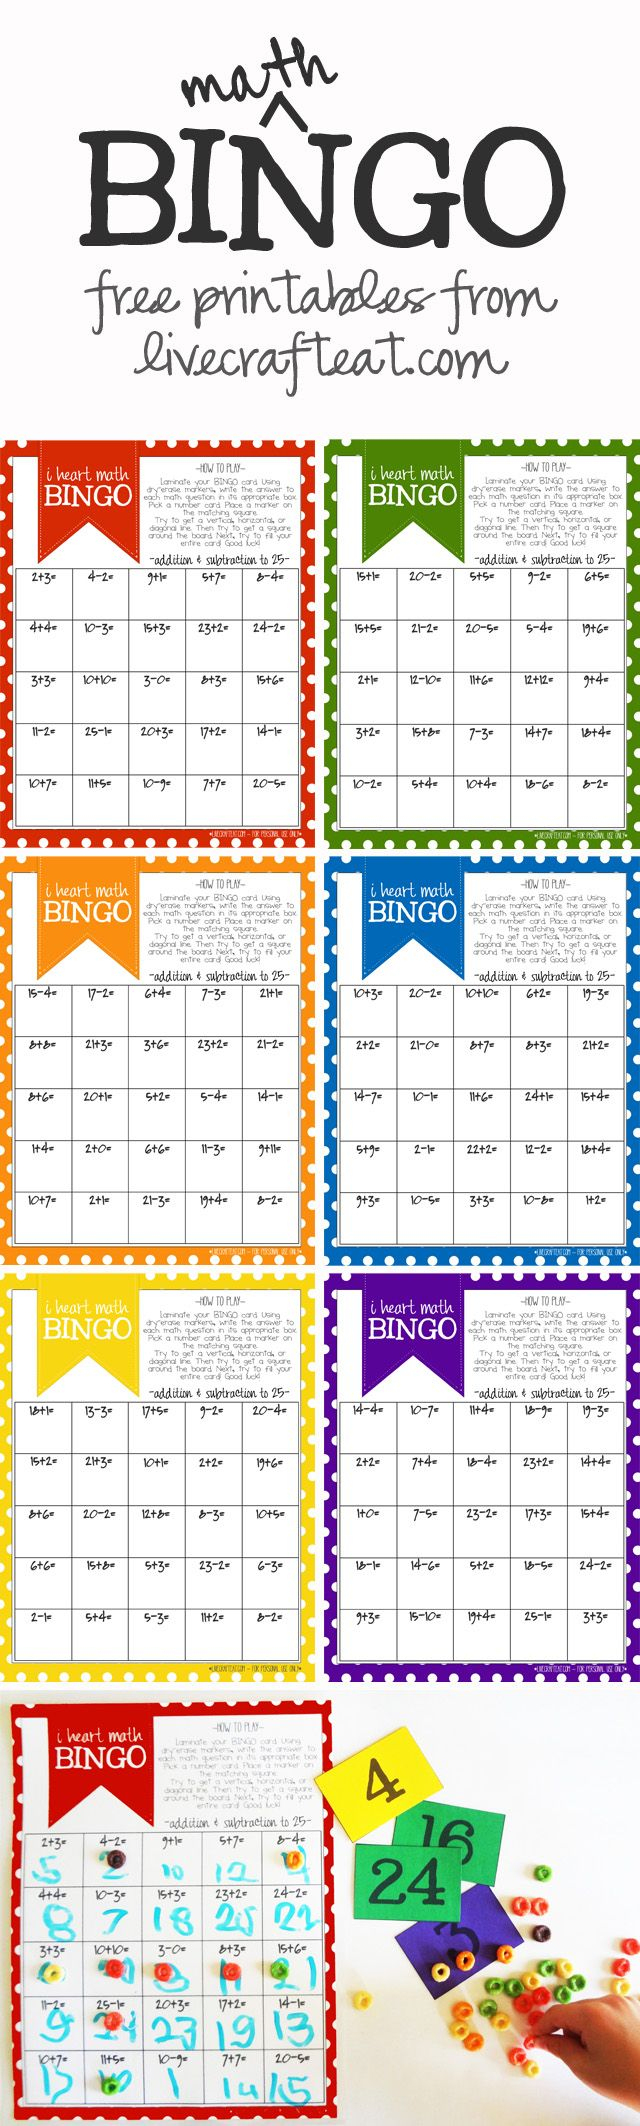 Math Bingo Printable For Kids - Free   Math Activities   Pinterest - Math Bingo Free Printable